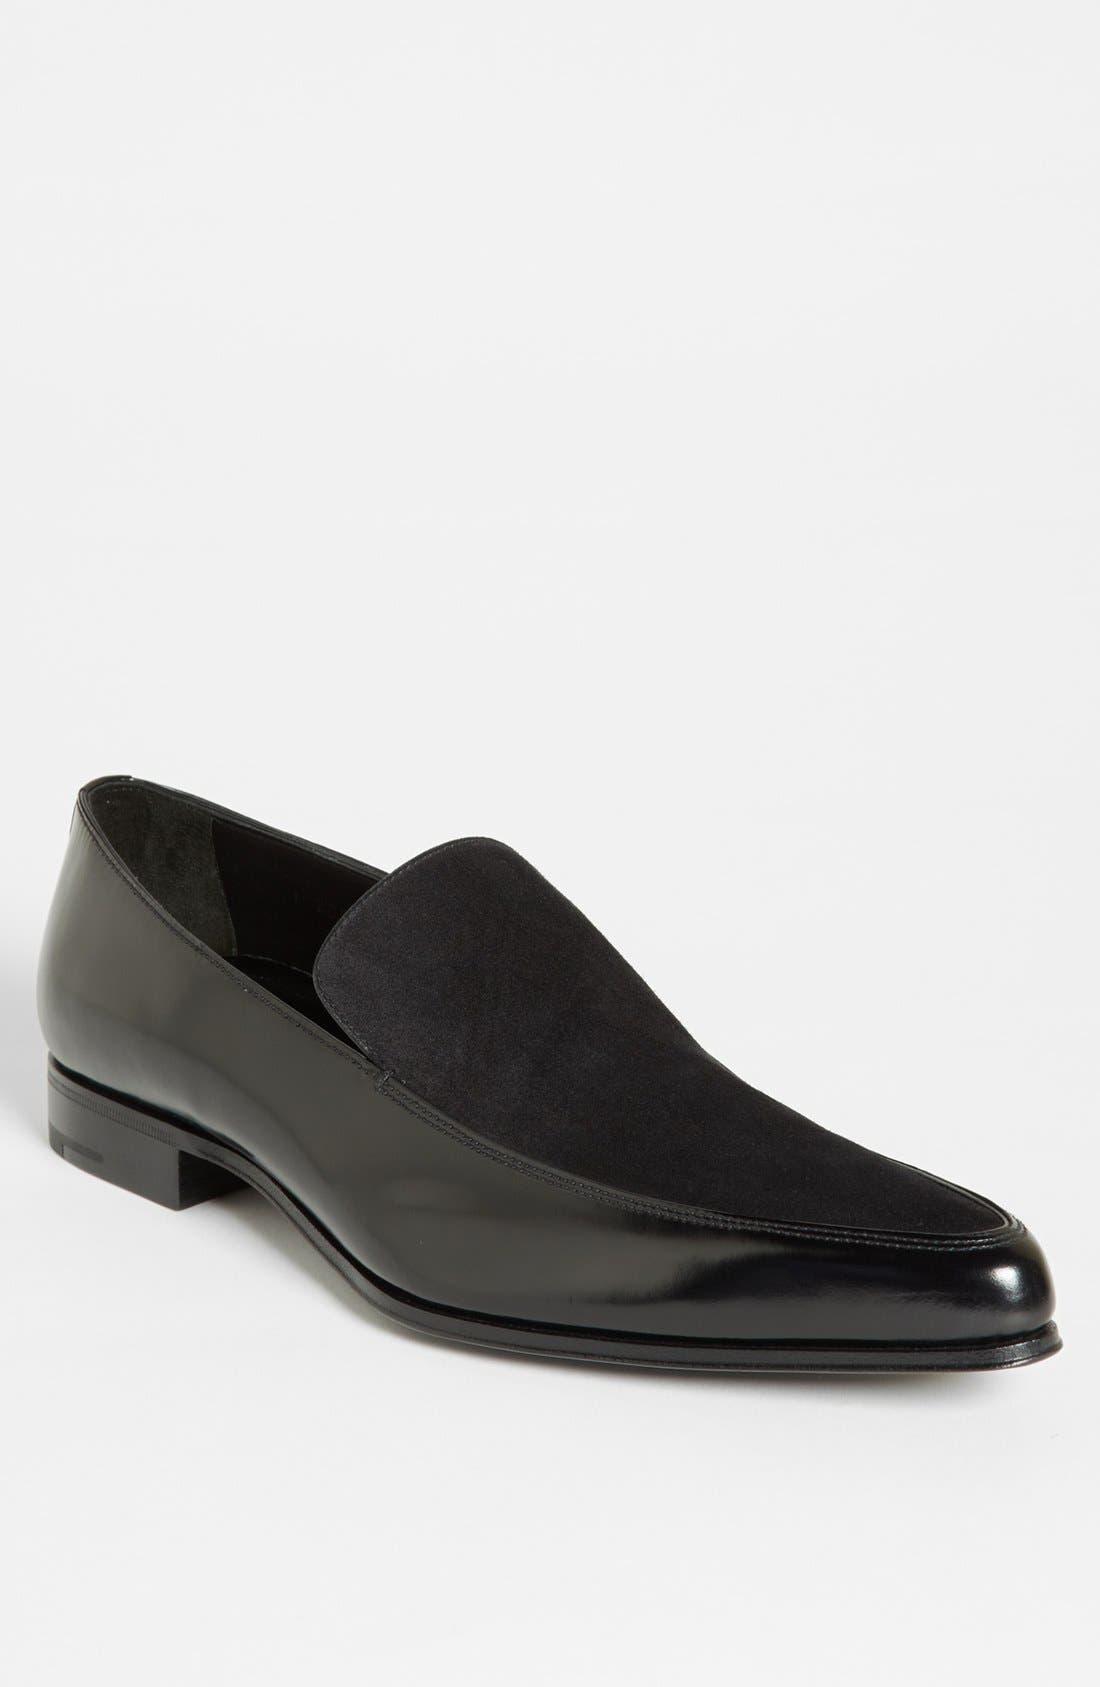 Main Image - Prada Pointed Loafer